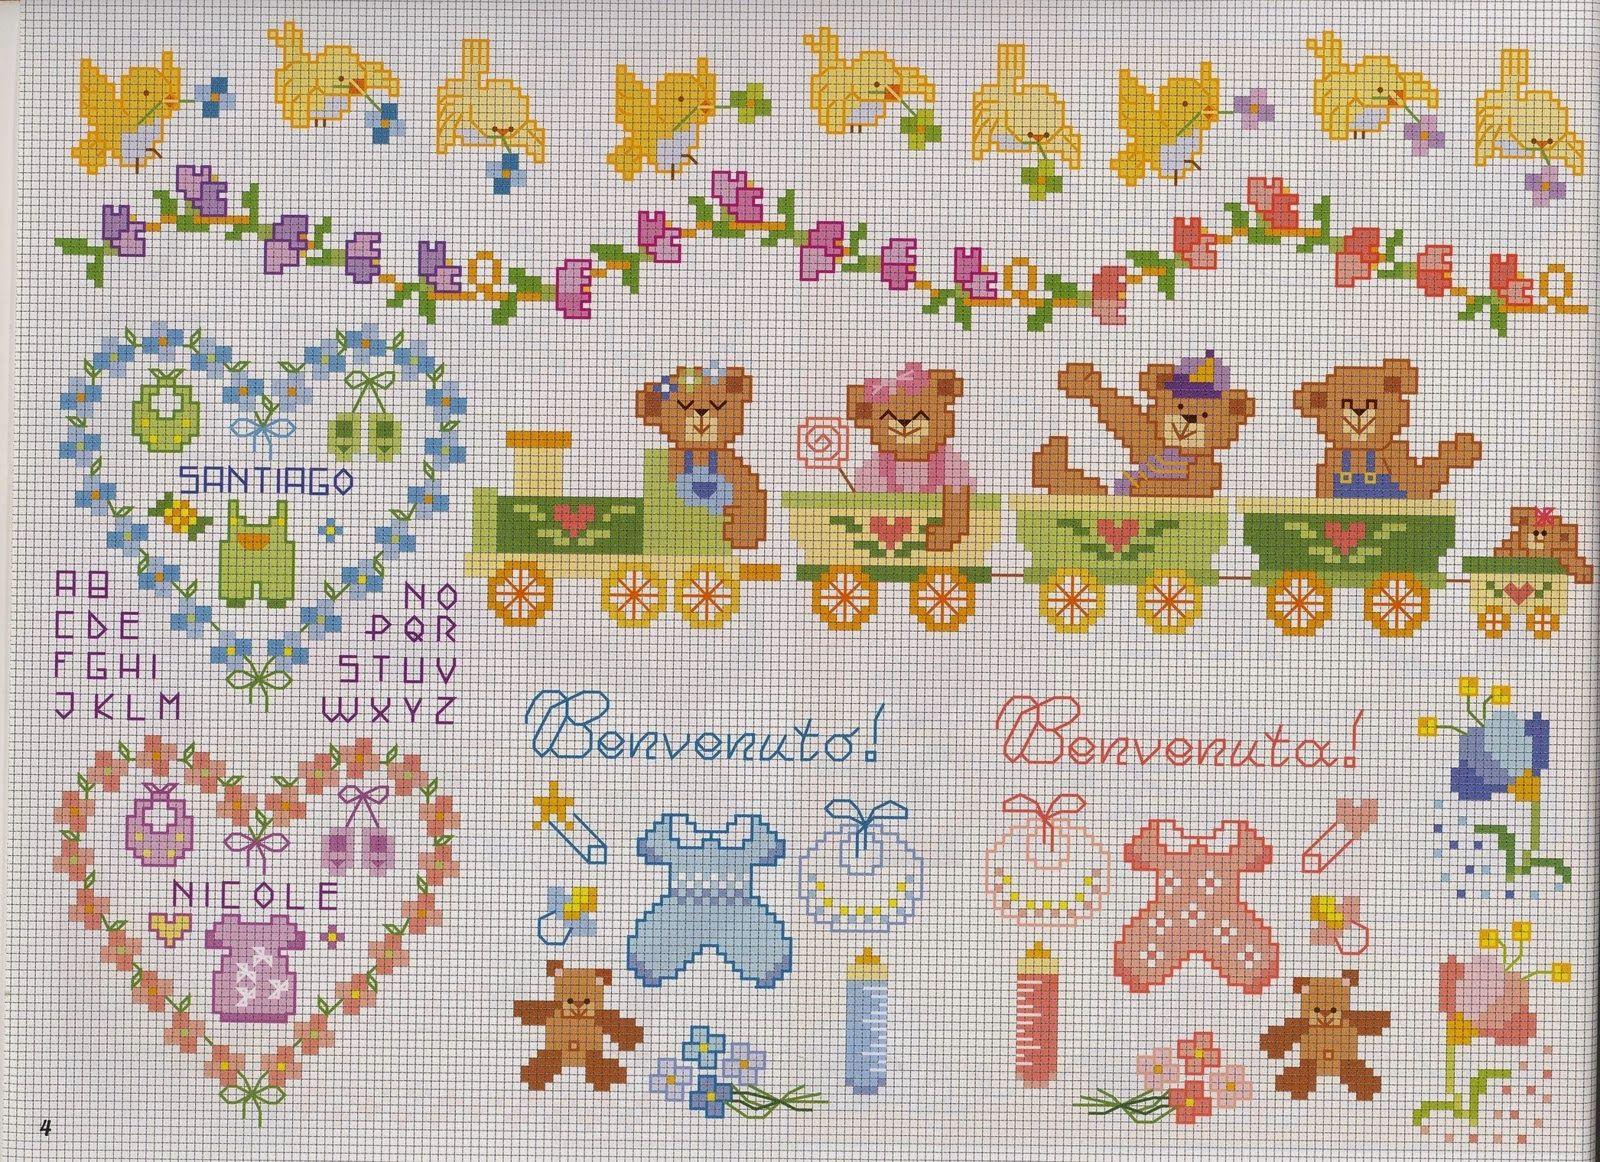 Punto croce schemi gratis e tutorial schemi punto croce for Farfalle a punto croce per bambini